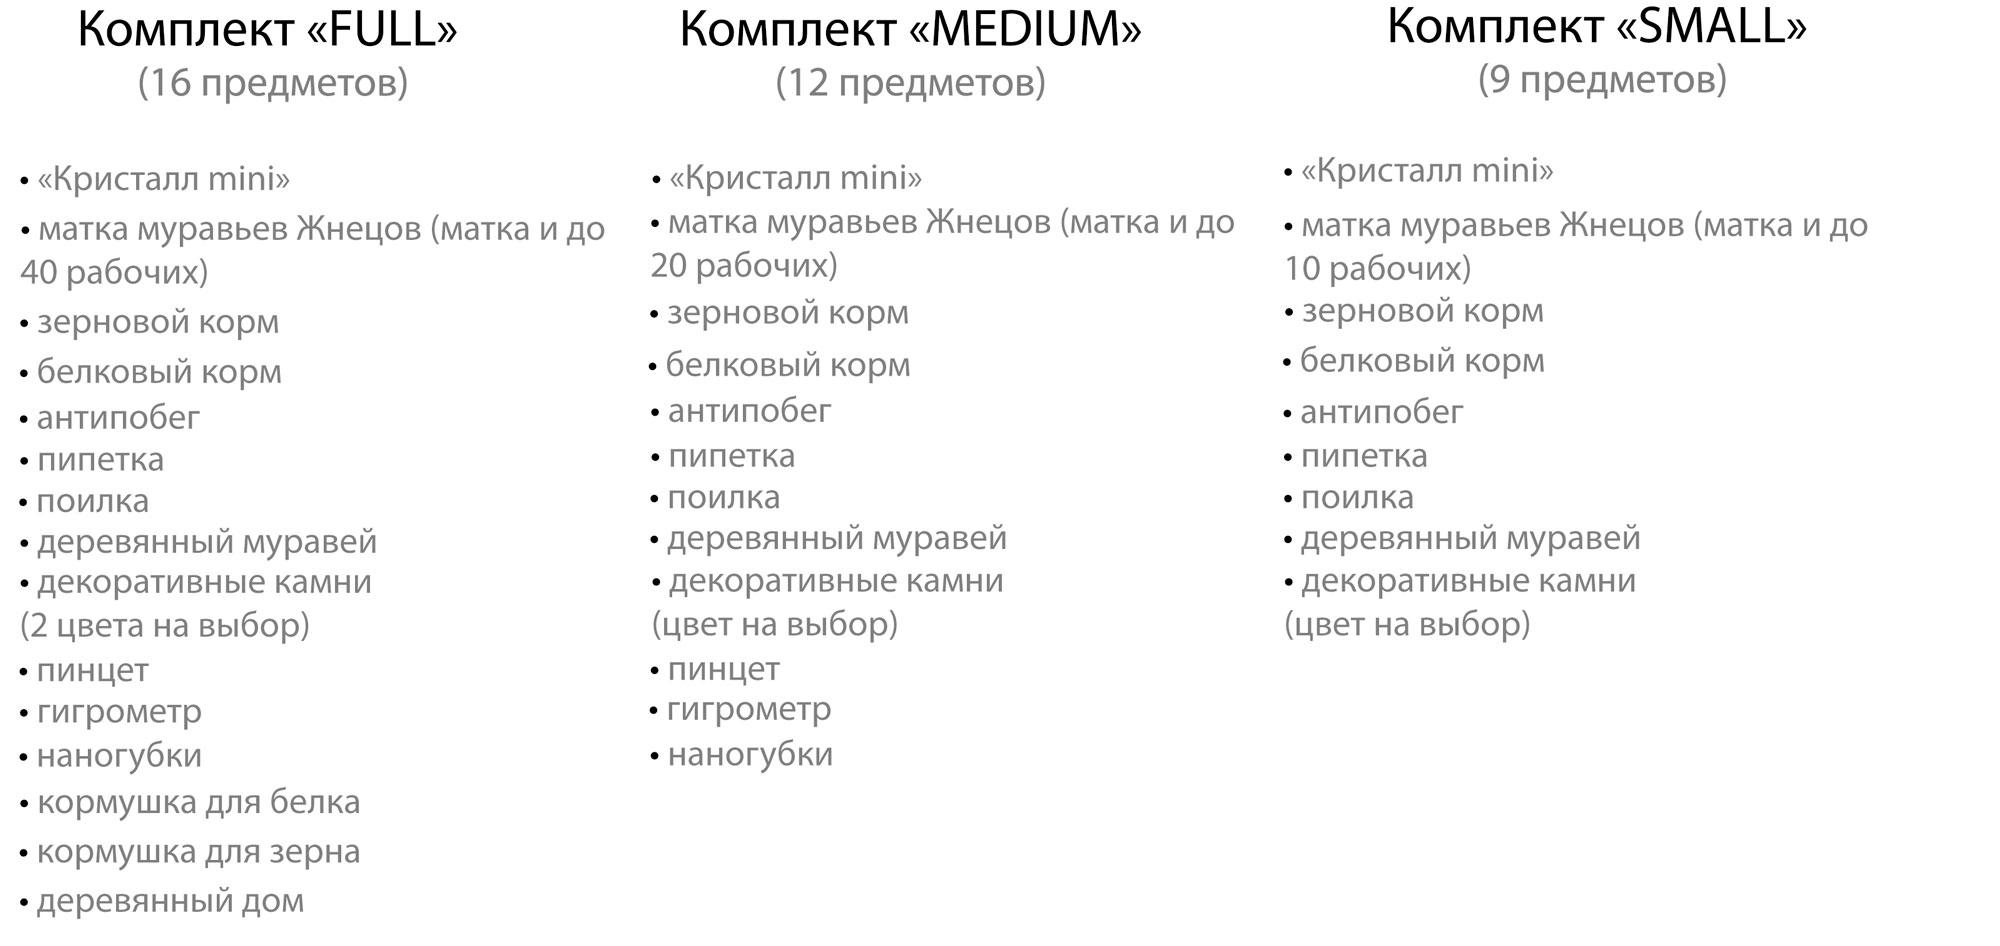 Таблица сравнения